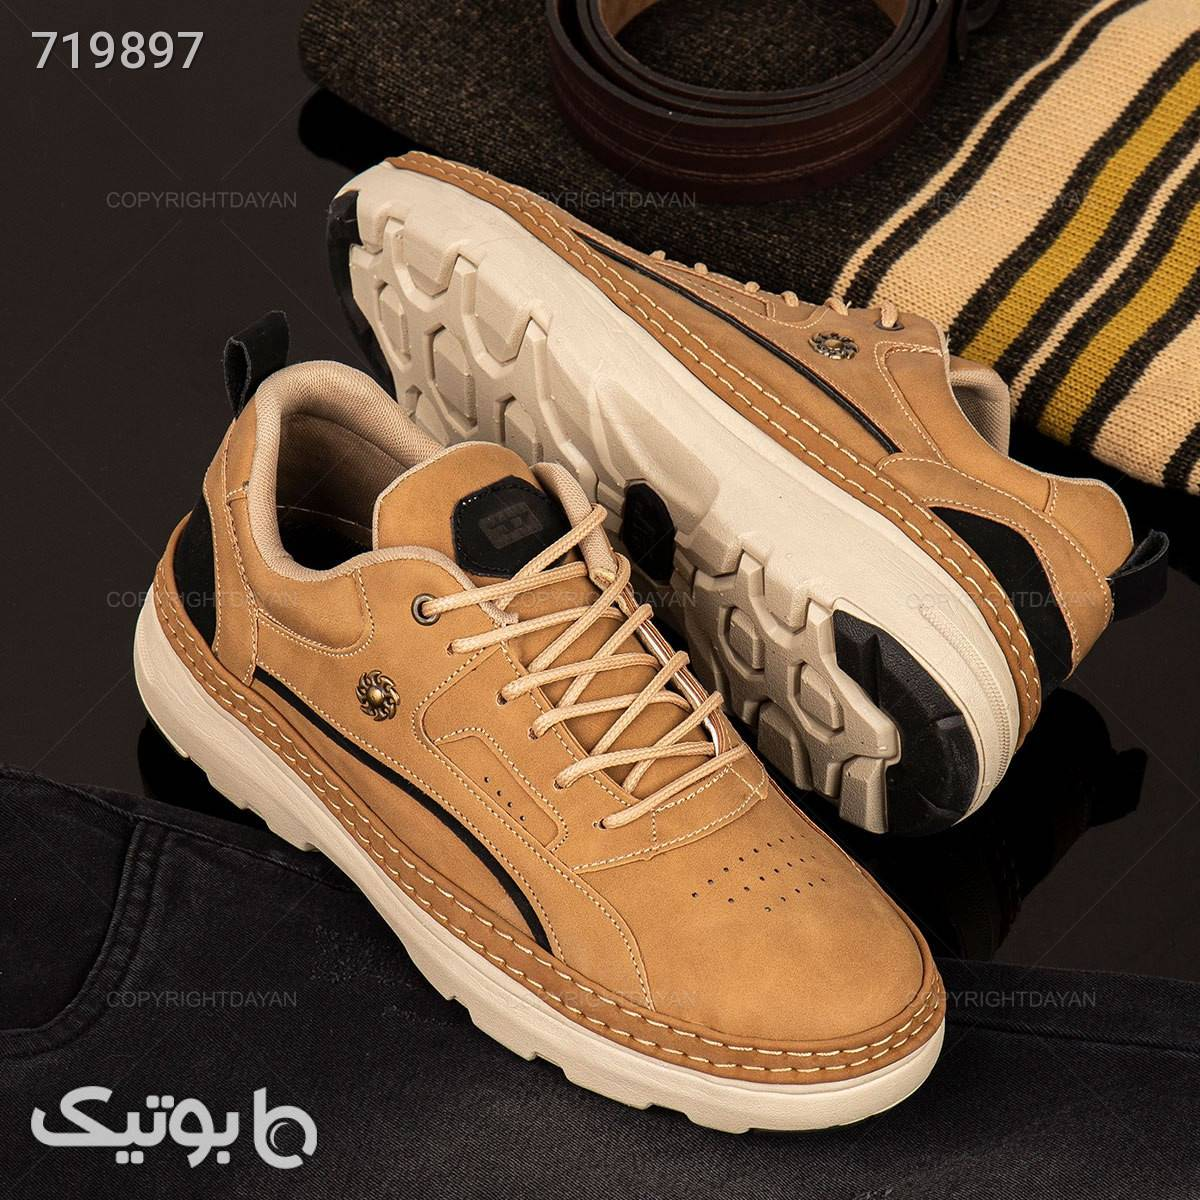 کفش مردانه Diesel مدل 18101 قهوه ای كفش مردانه